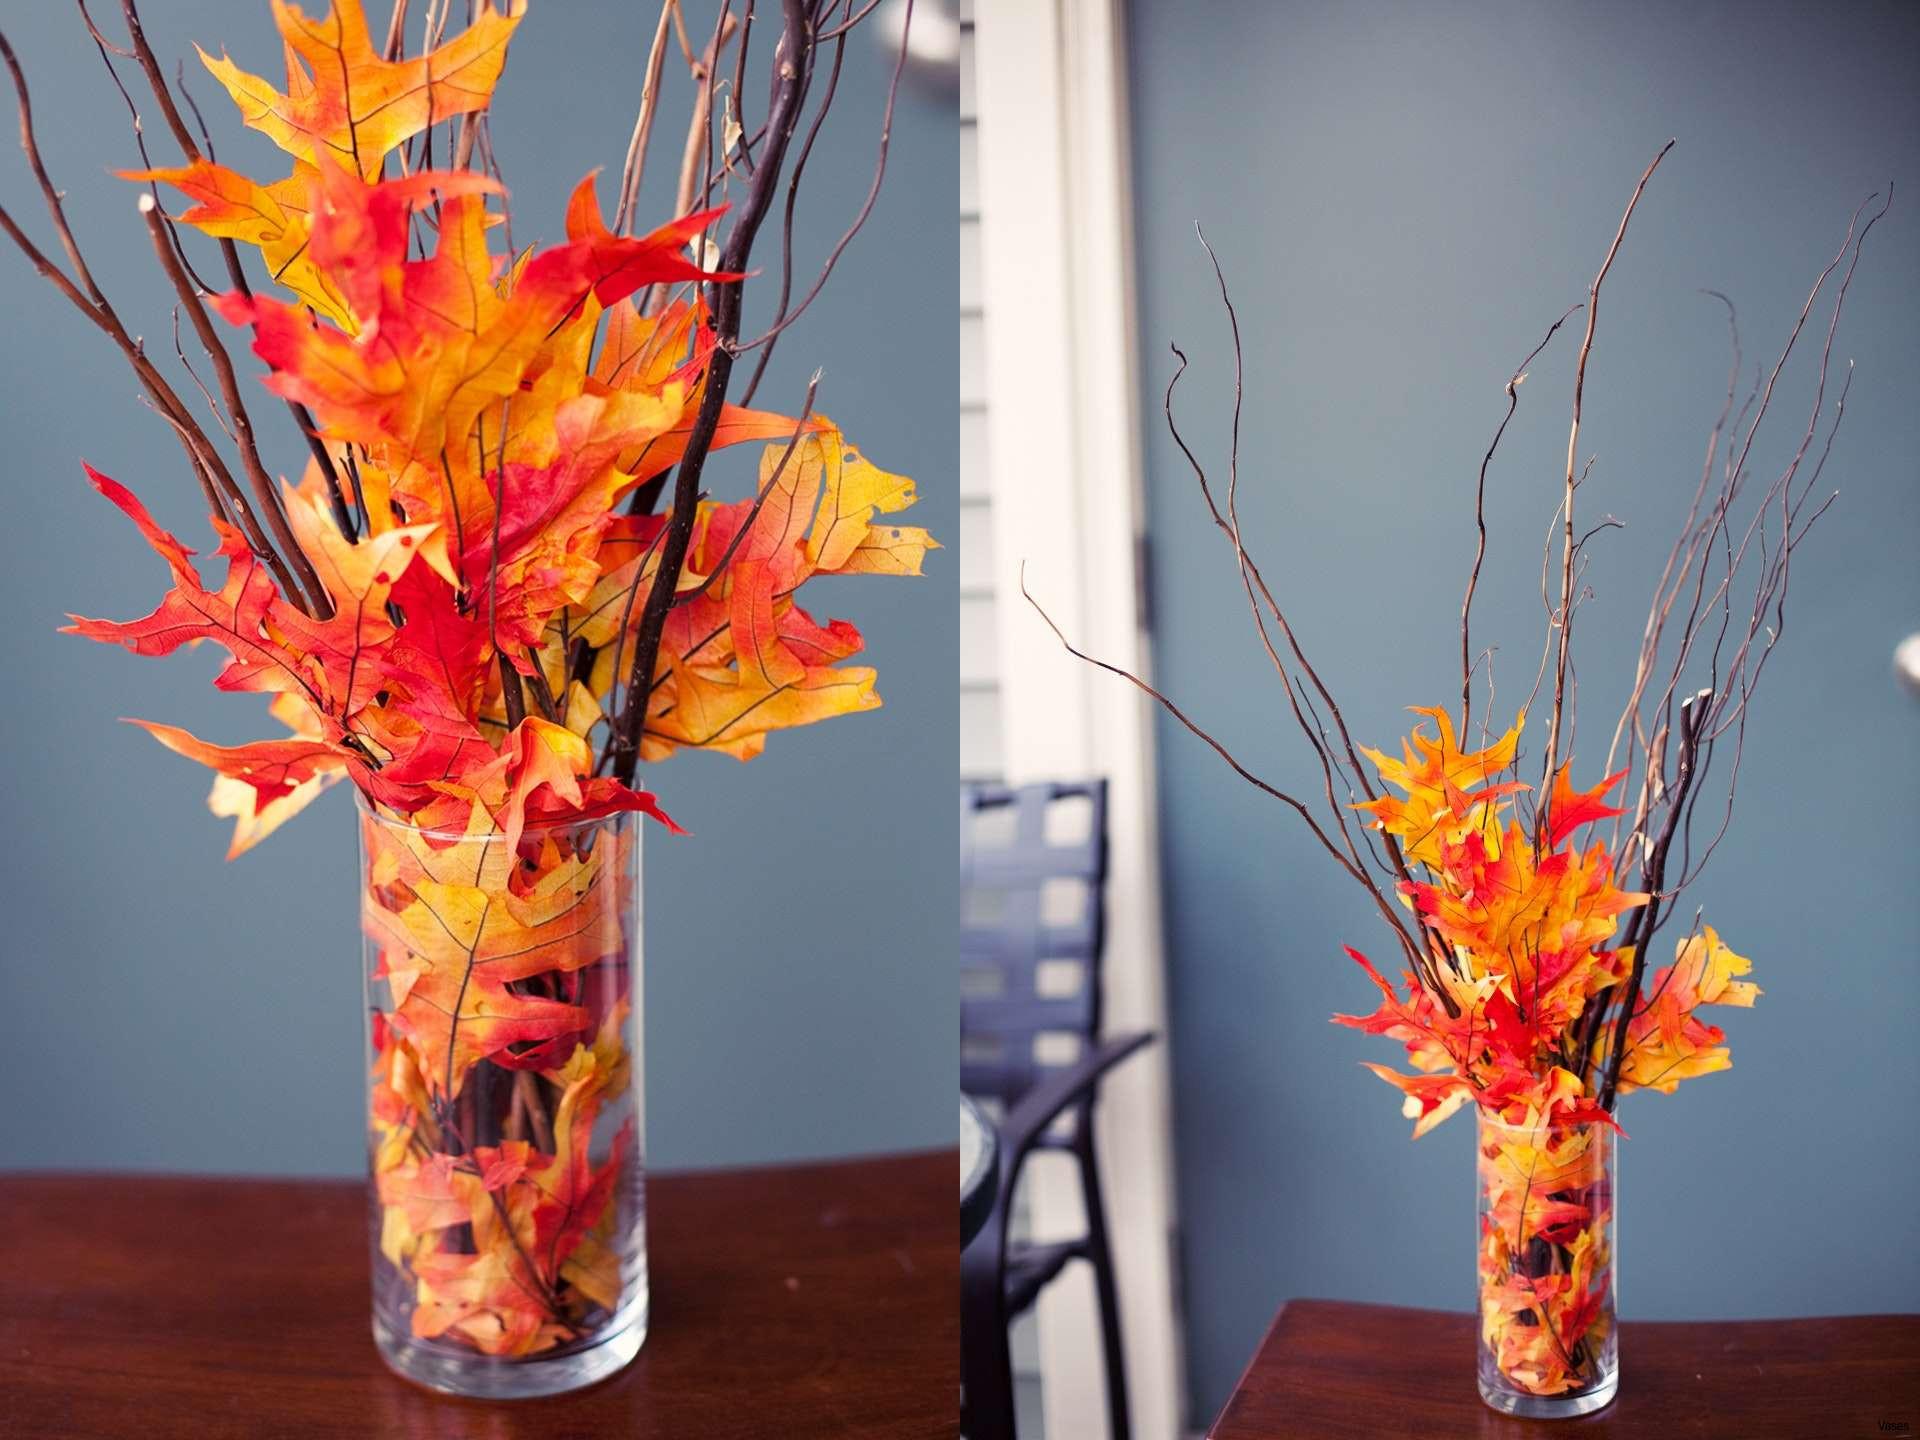 Decorating Ideas for Hurricane Vases Of Vases Fall Vase Ideas Decorating Idea Diy Lighted Autumn Hurricane within Vases Fall Vase Ideas Decorating Idea Diy Lighted Autumn Hurricane Design Ideas Of Diy Decorating Ideas